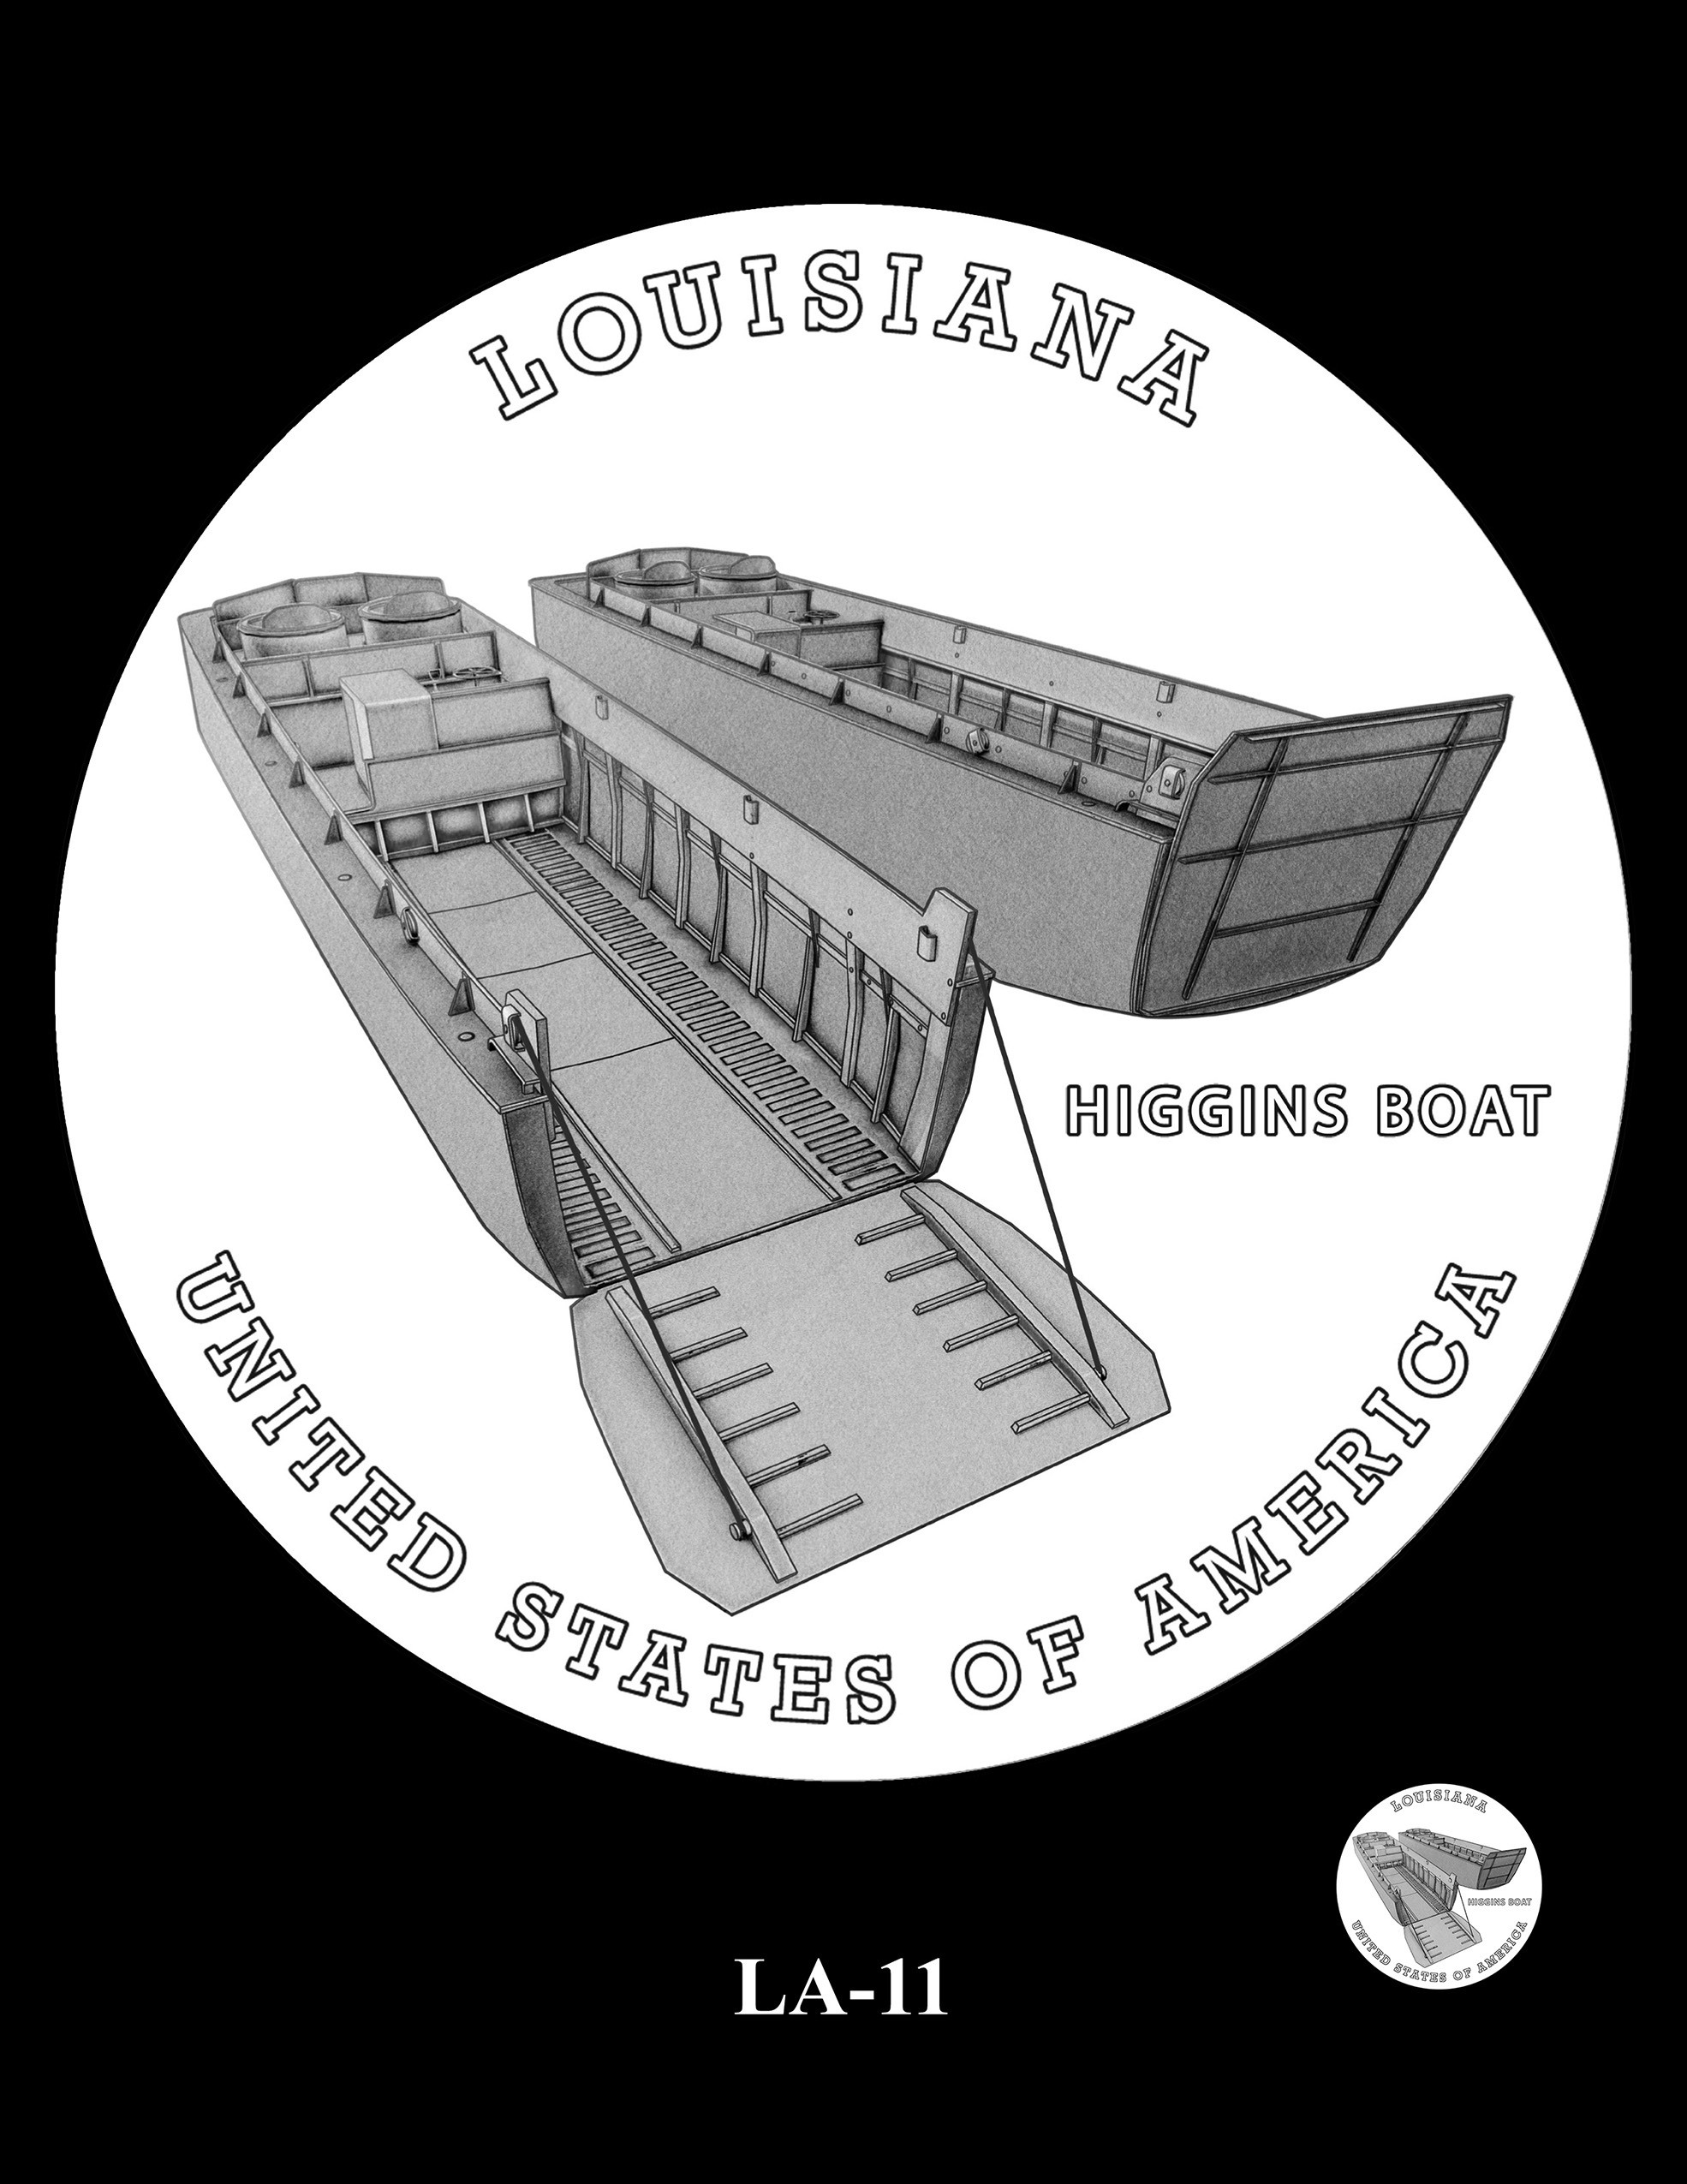 LA-11 -- 2023 American Innovation $1 Coin Program - Louisiana